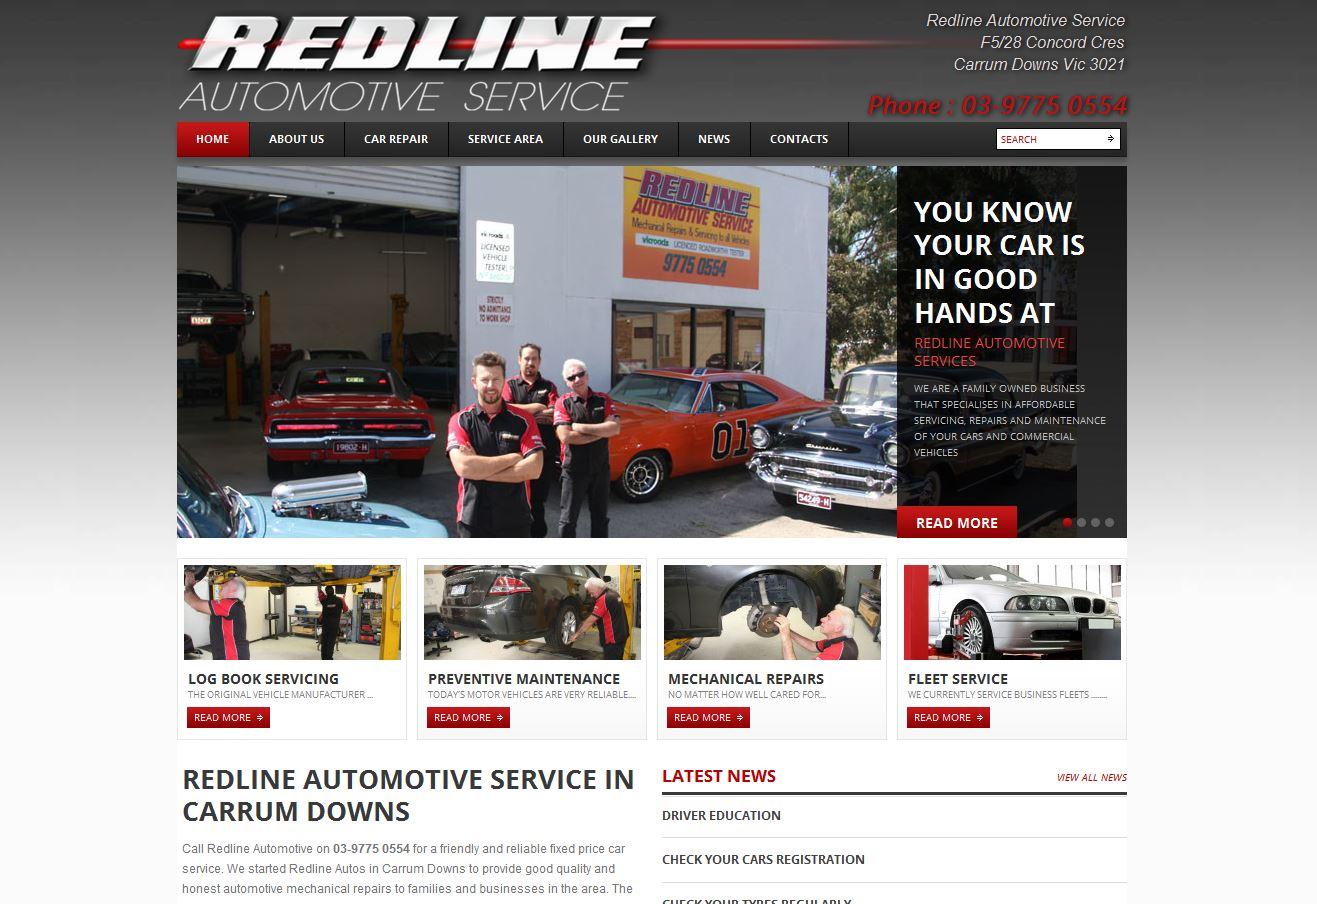 371890-Redline autos website